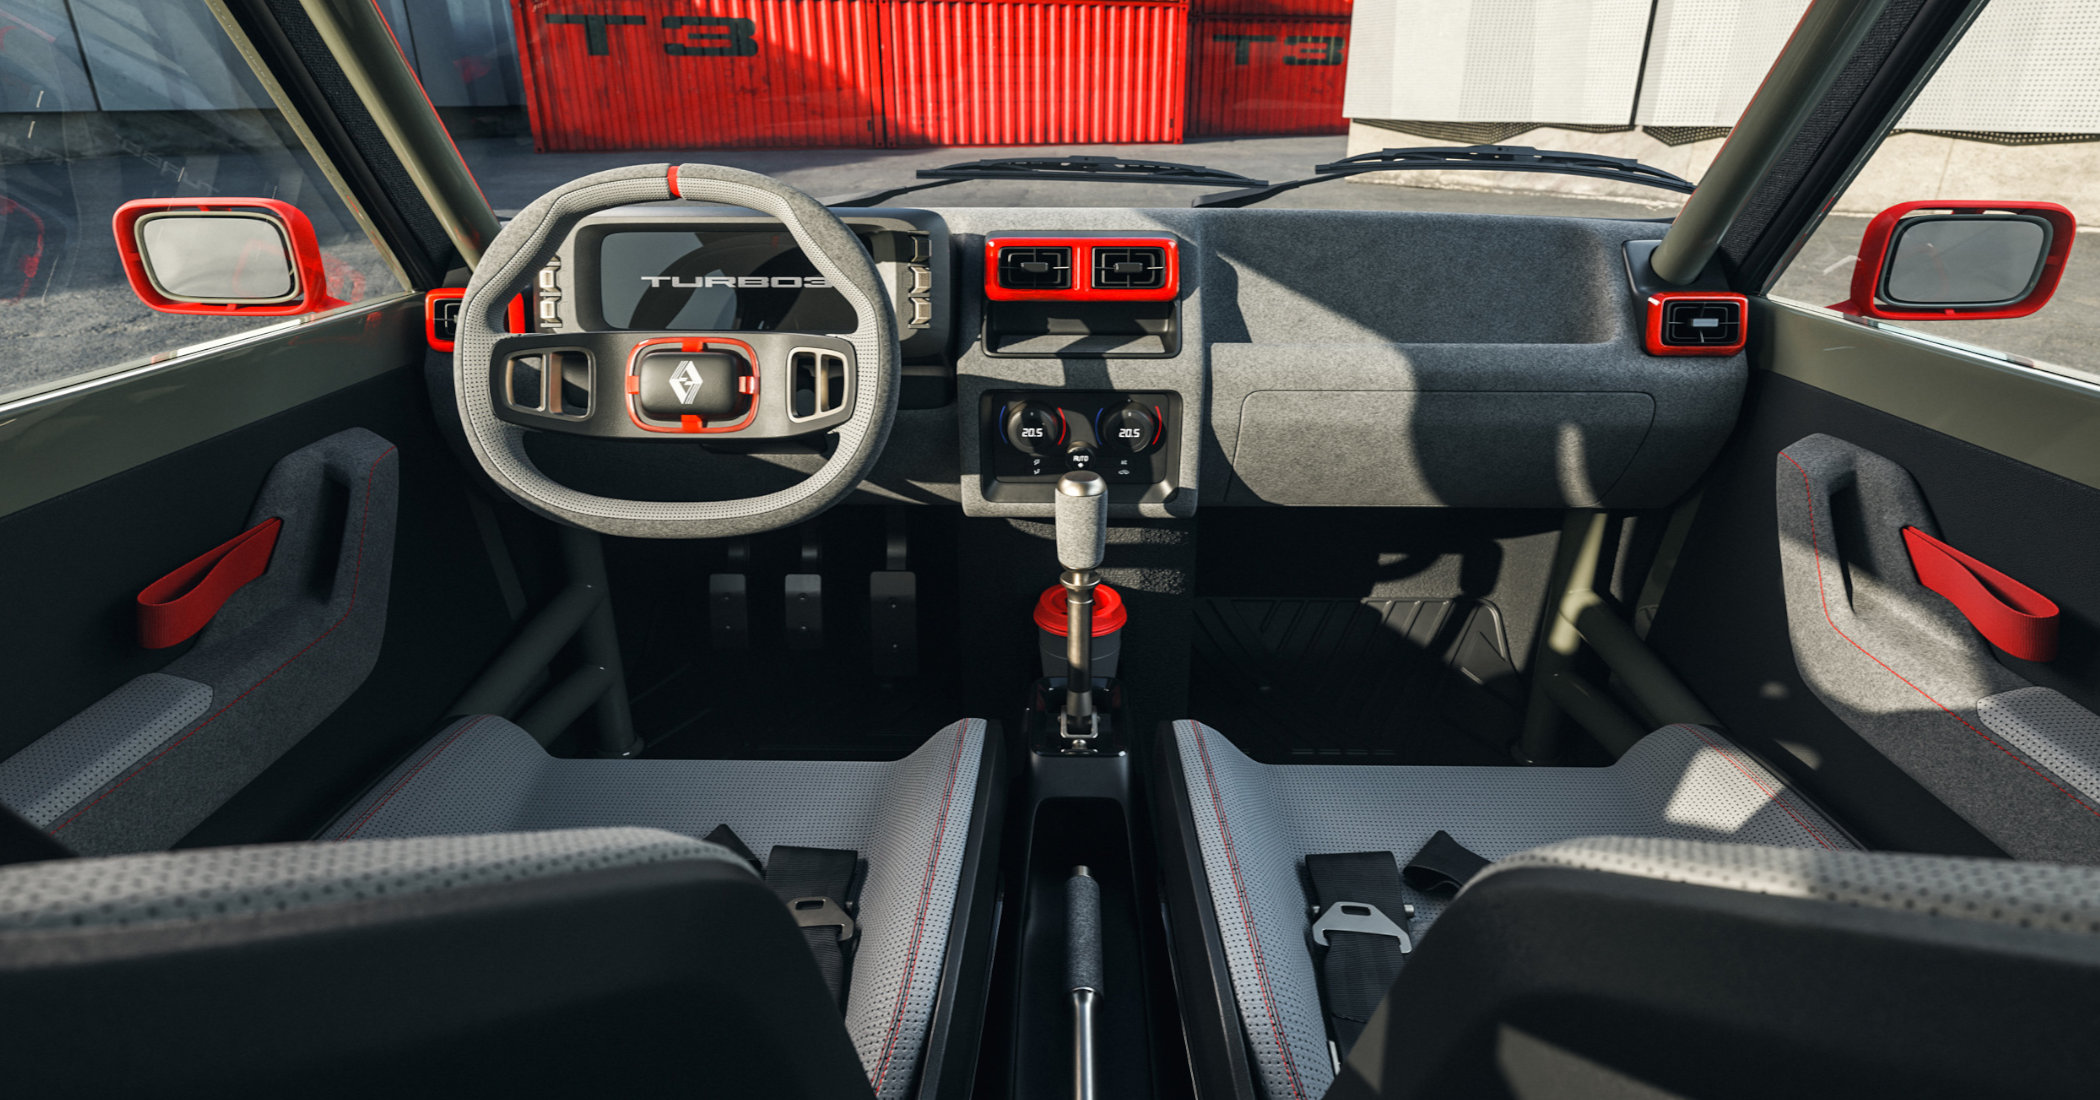 Legende Automobiles Turbo III 8